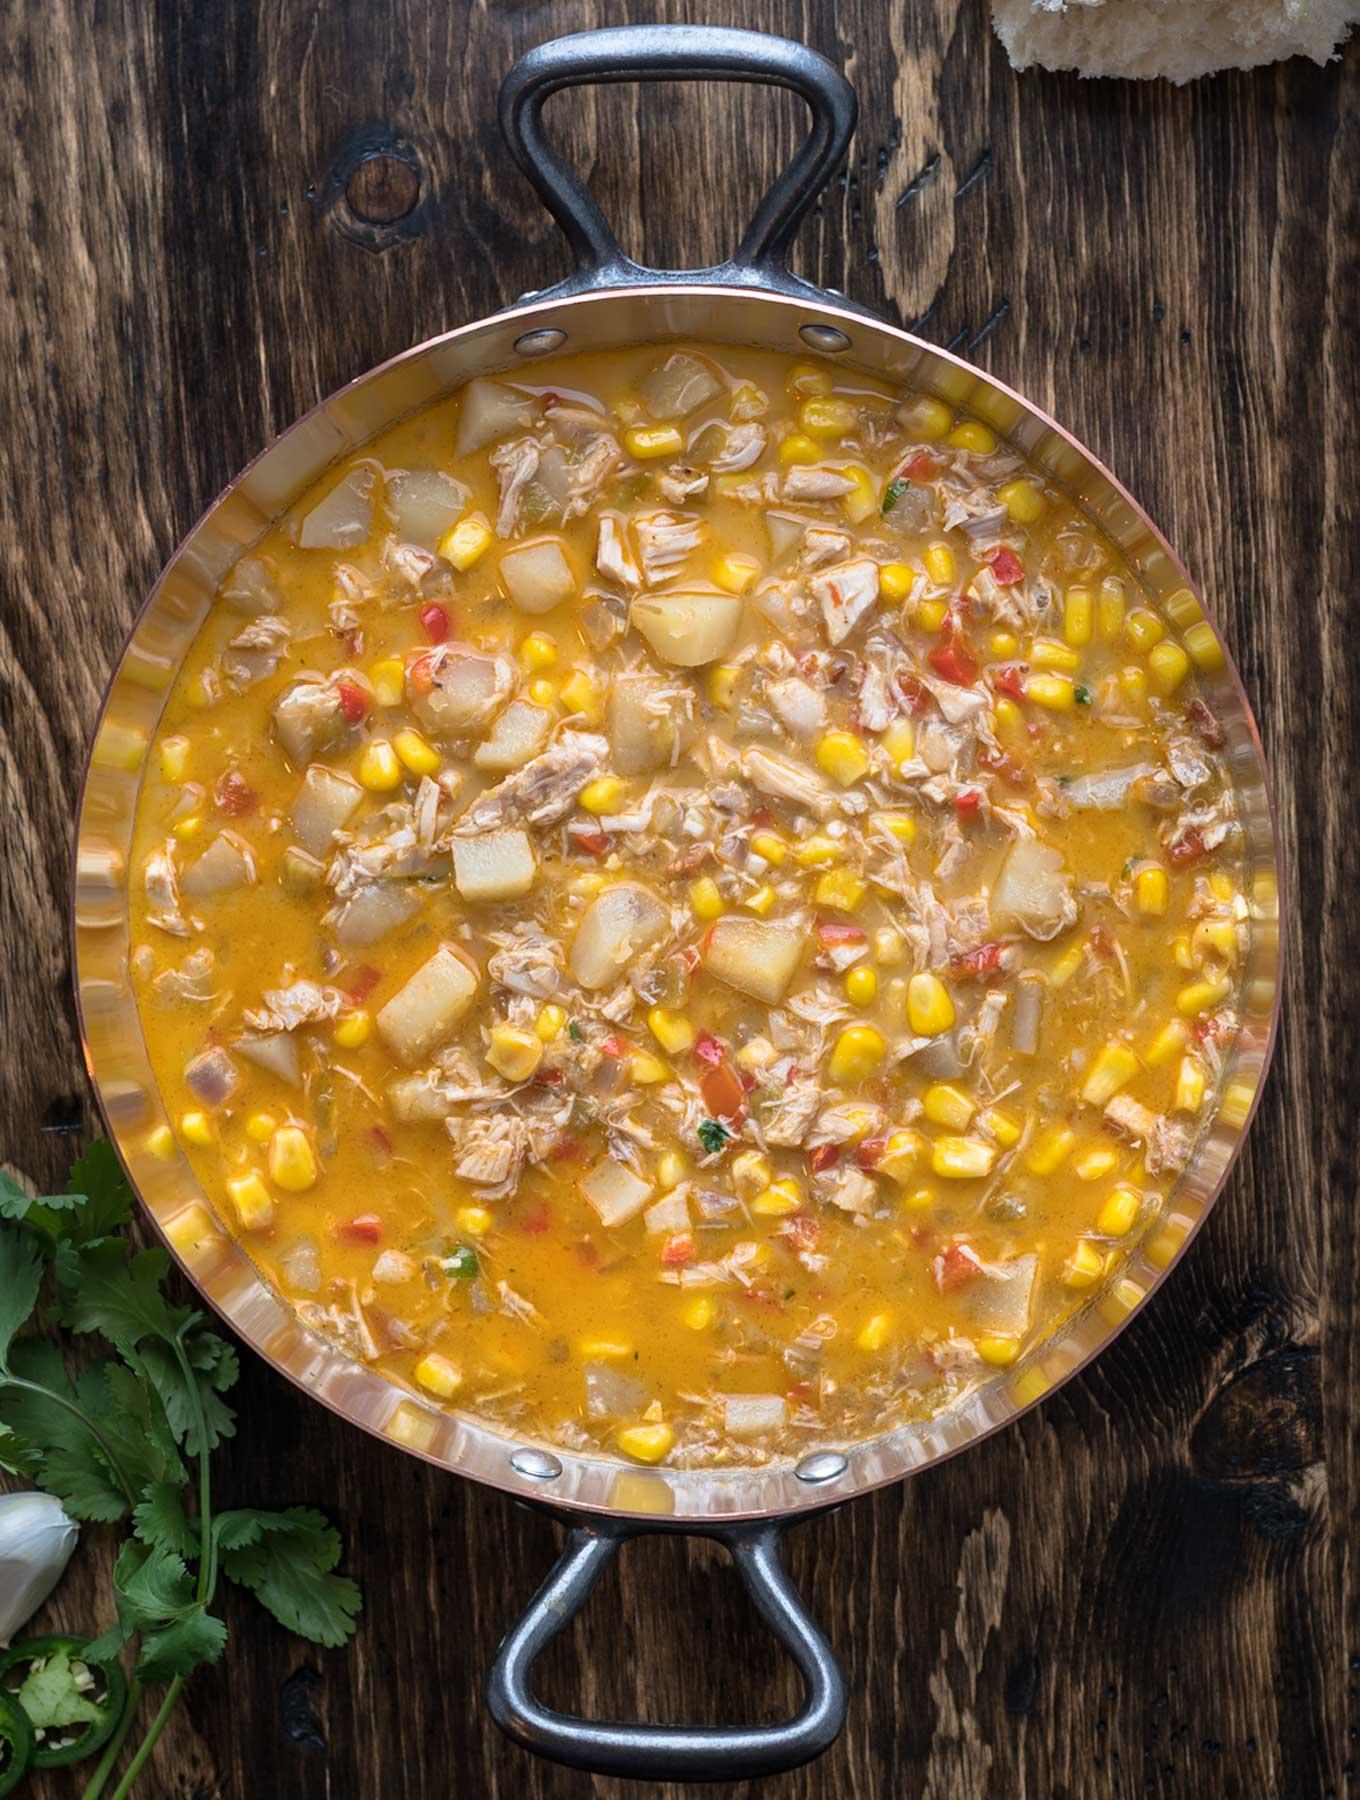 Pot of Southwest Corn Chowder